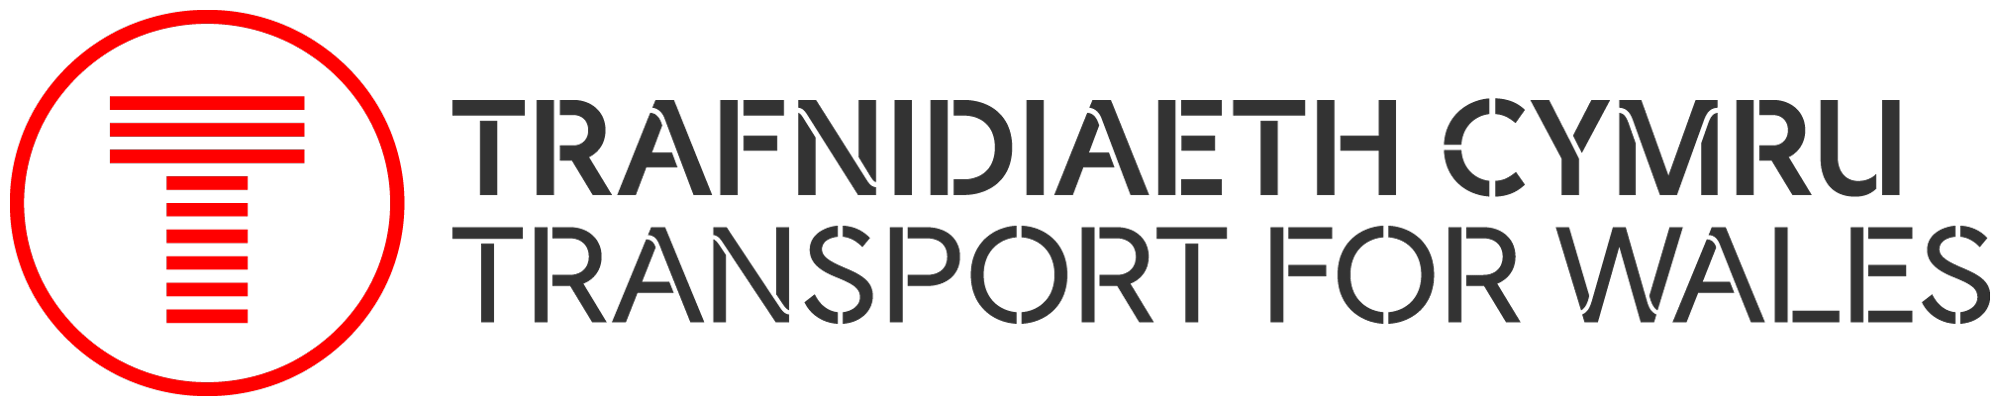 New Logo for Transport for Wales by Smörgåsbord